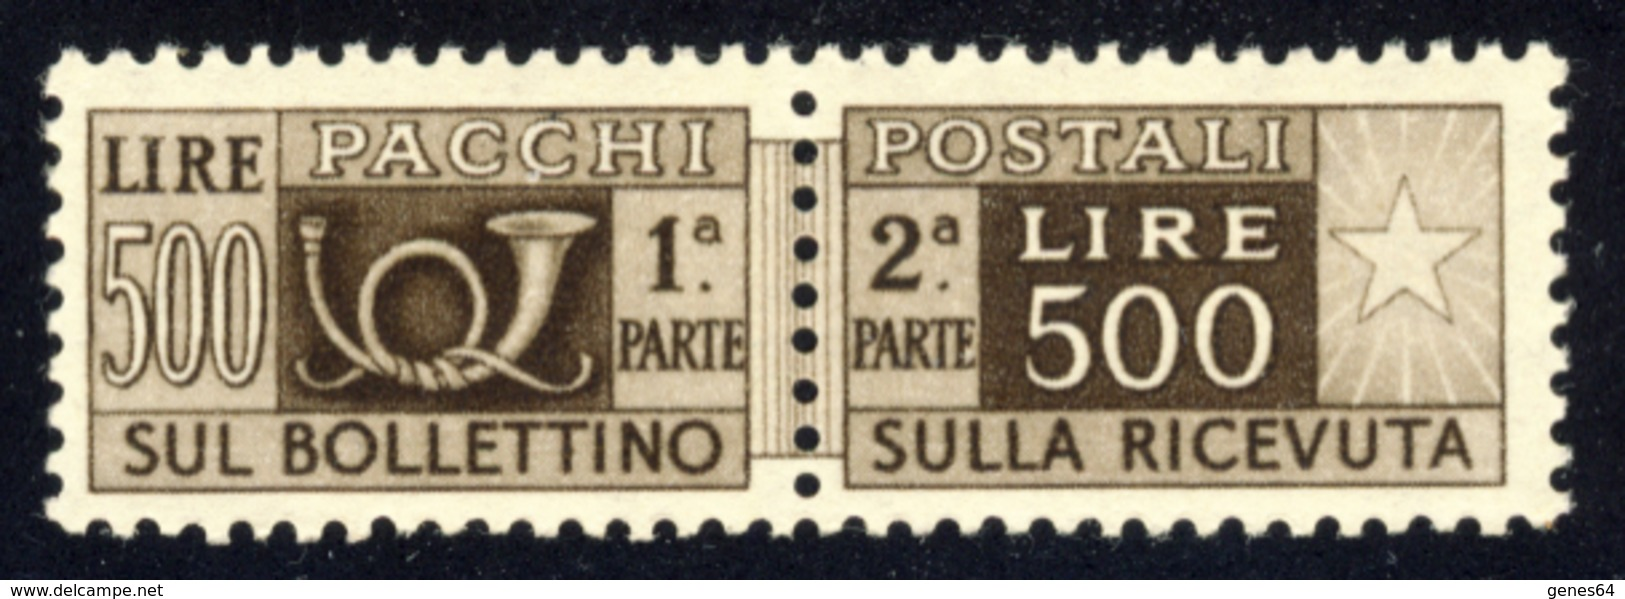 1946 – Pacchi Postali 500 Lire Bruno Scuro Filigrana Ruota (DA) MNH** - 6. 1946-.. República